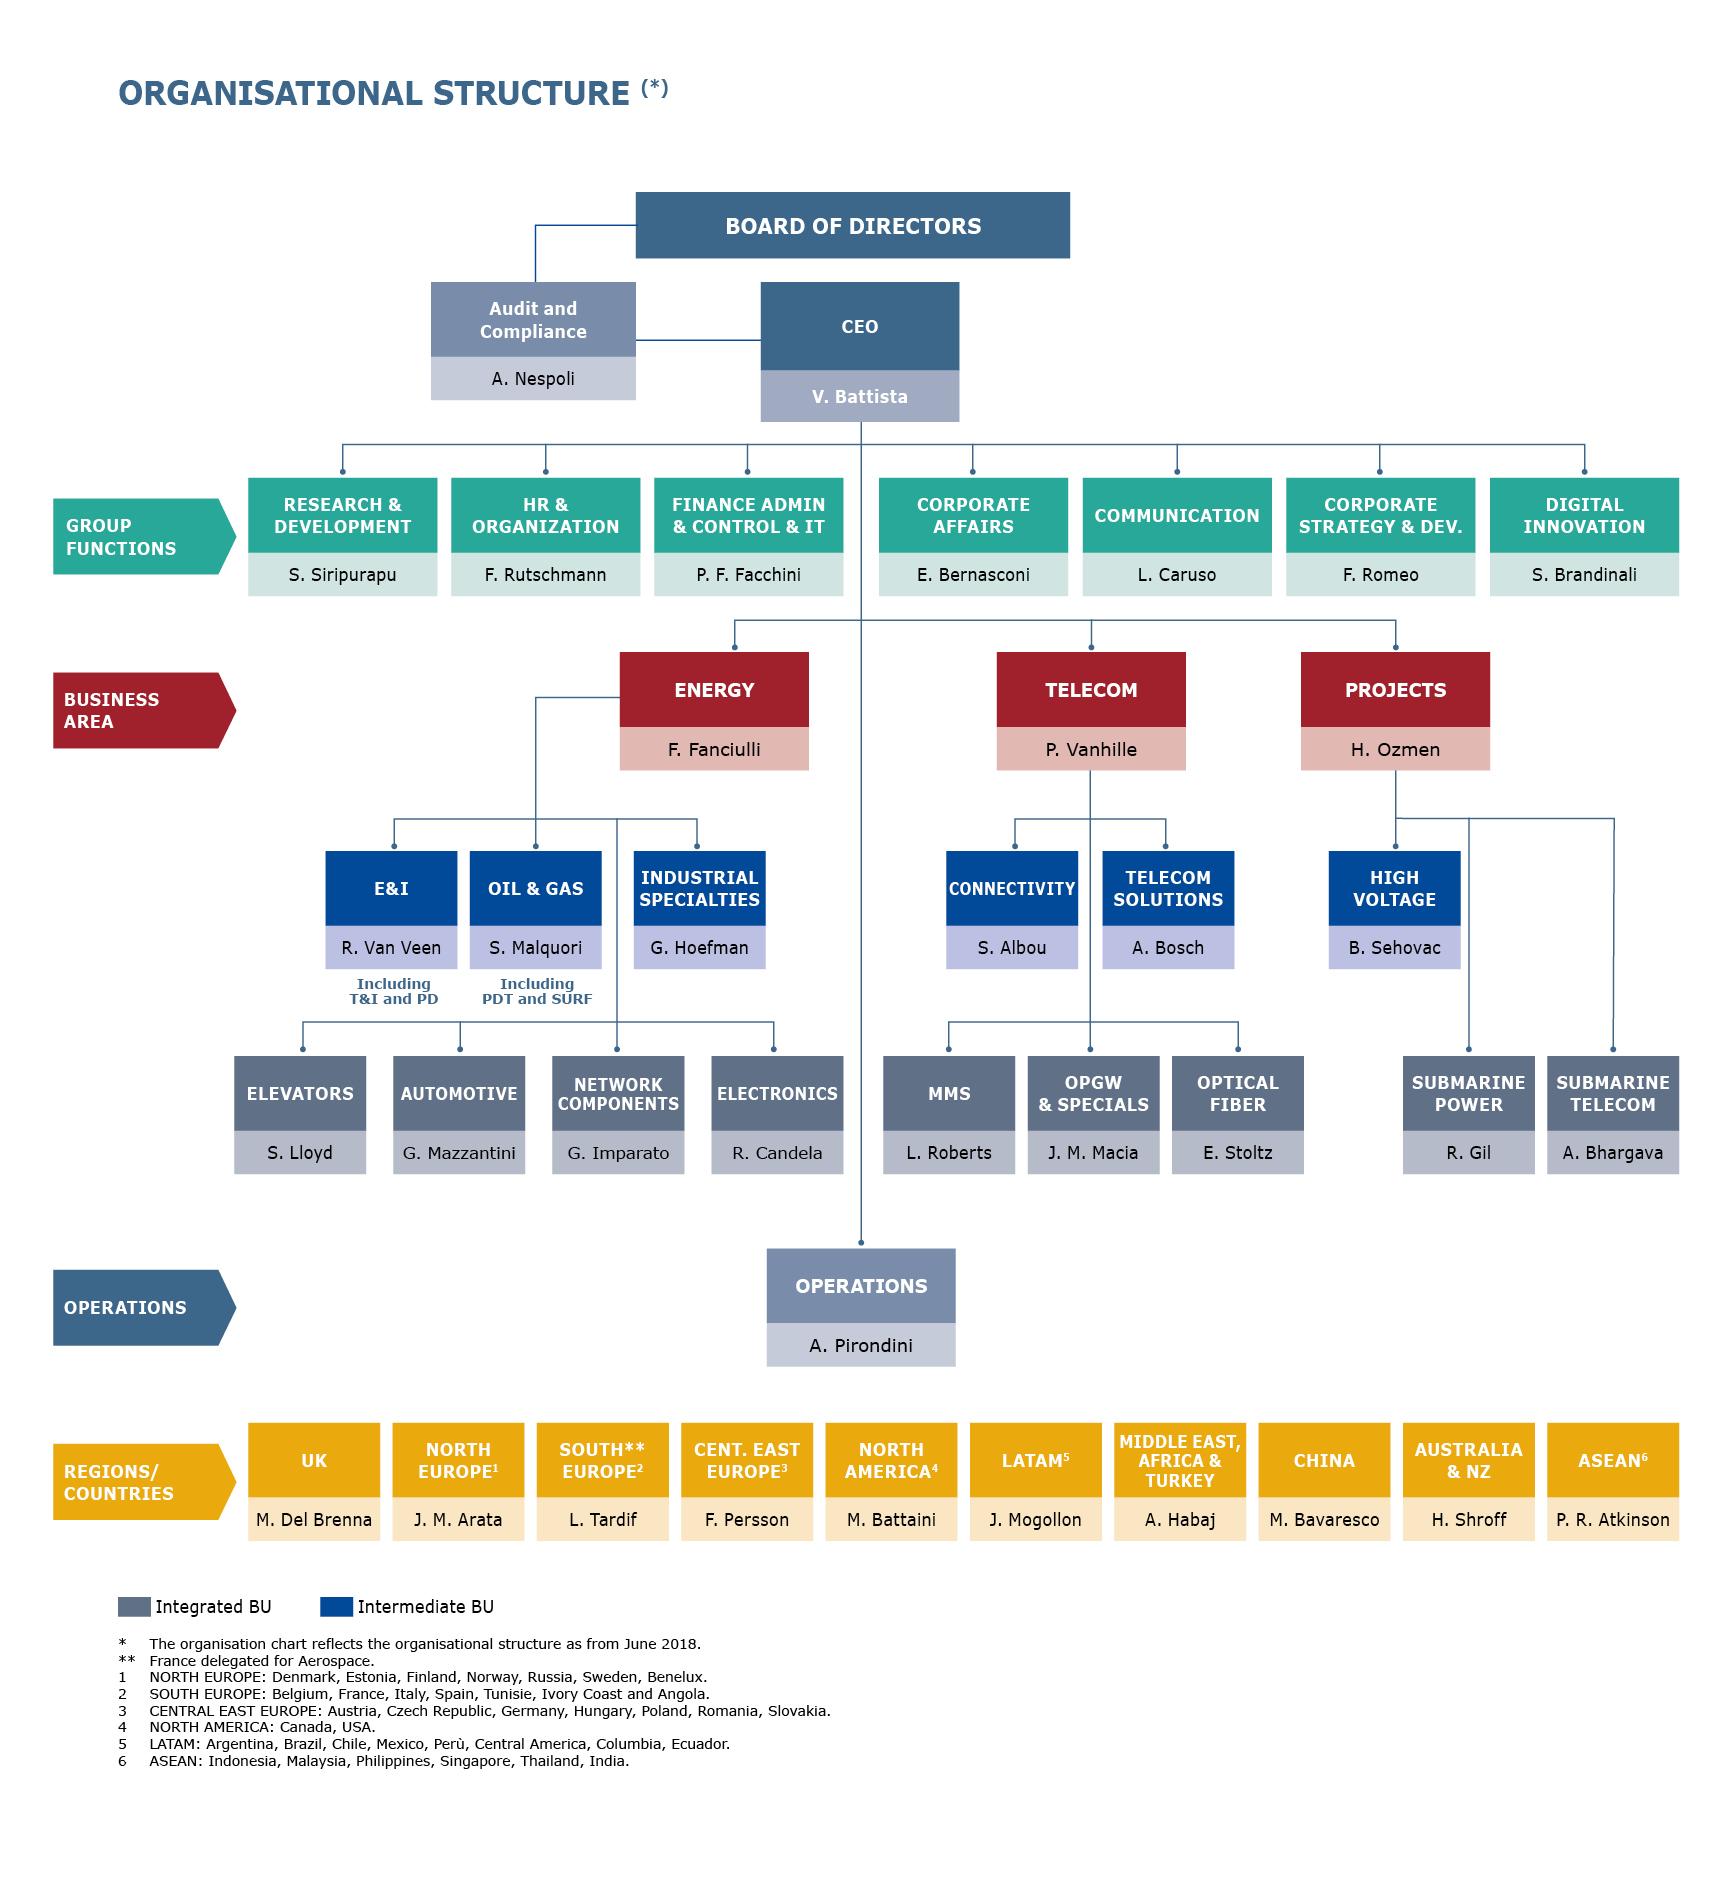 Organisational Structure Prysmian Group